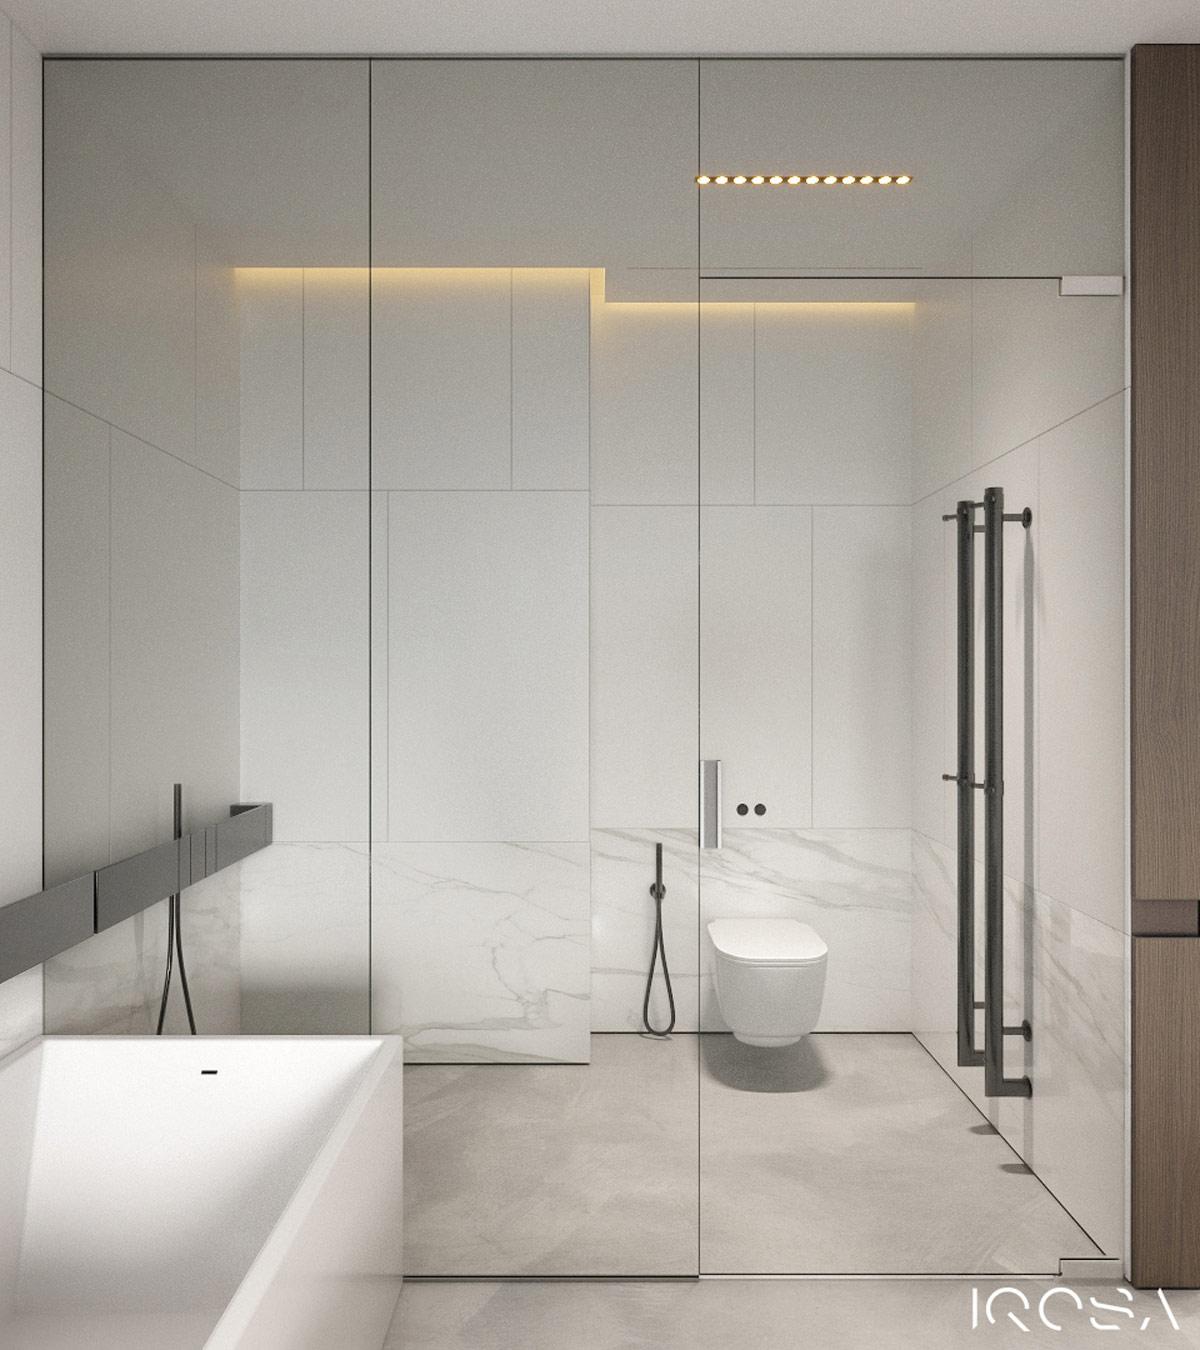 Smoky Grey Interior With Warm Ambient Lighting